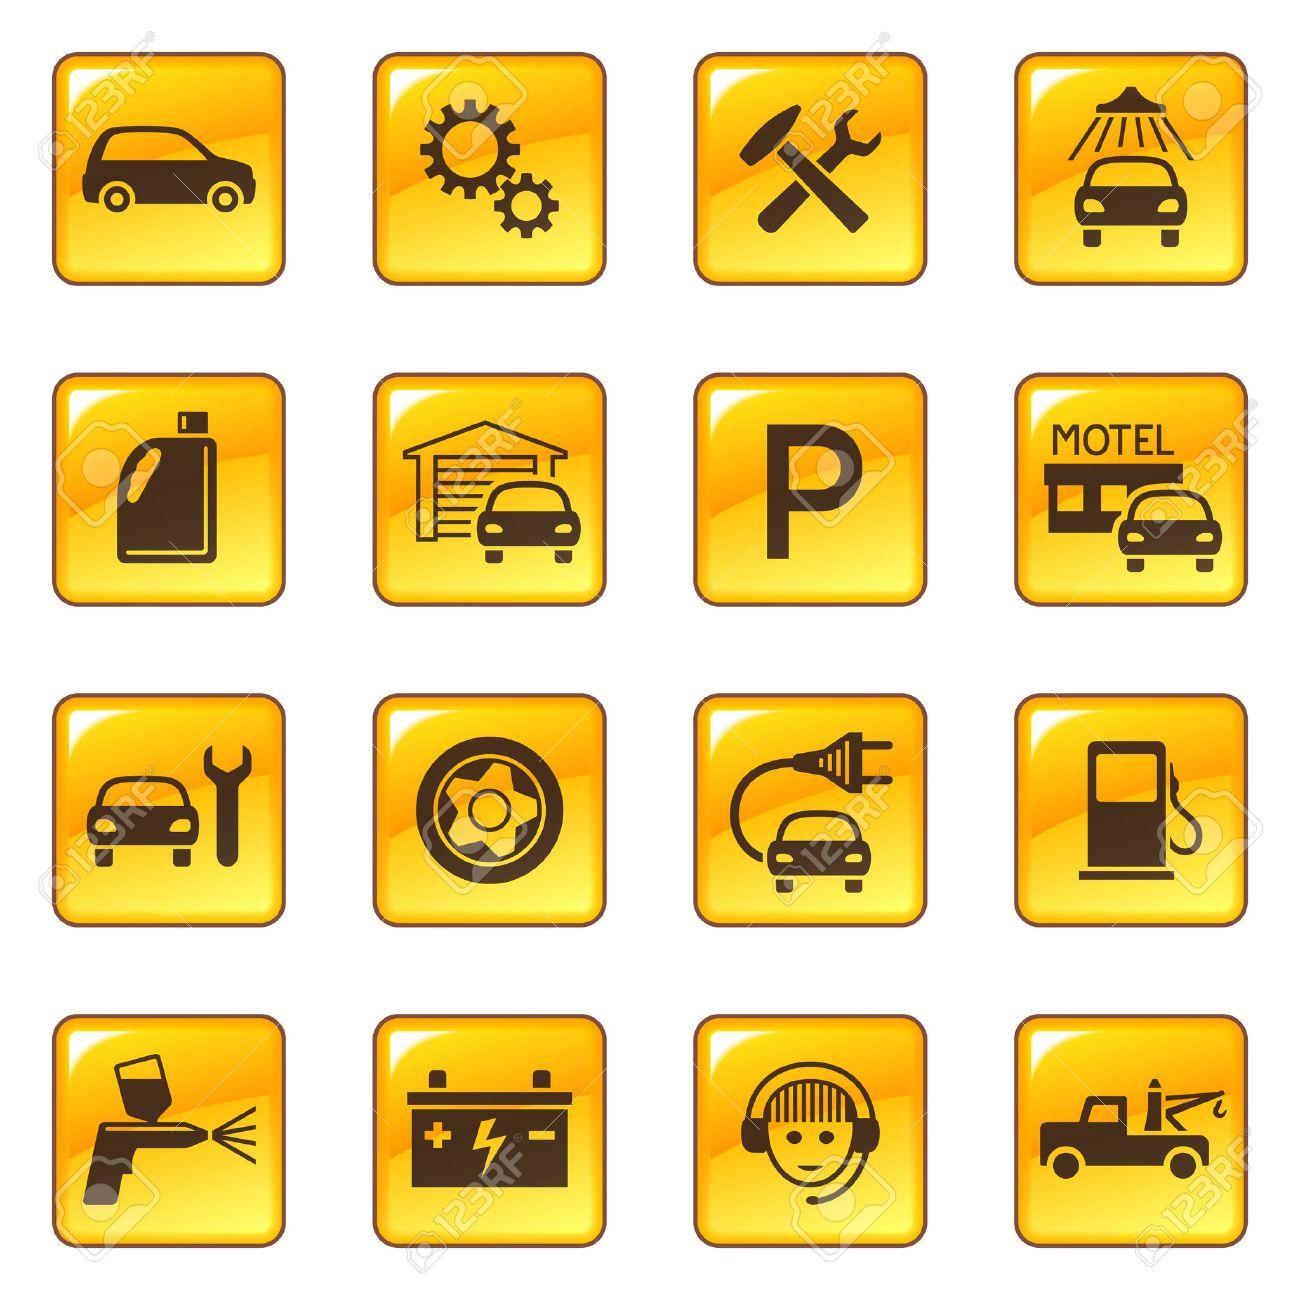 Car service & repair icons Stock Vector - 6234614